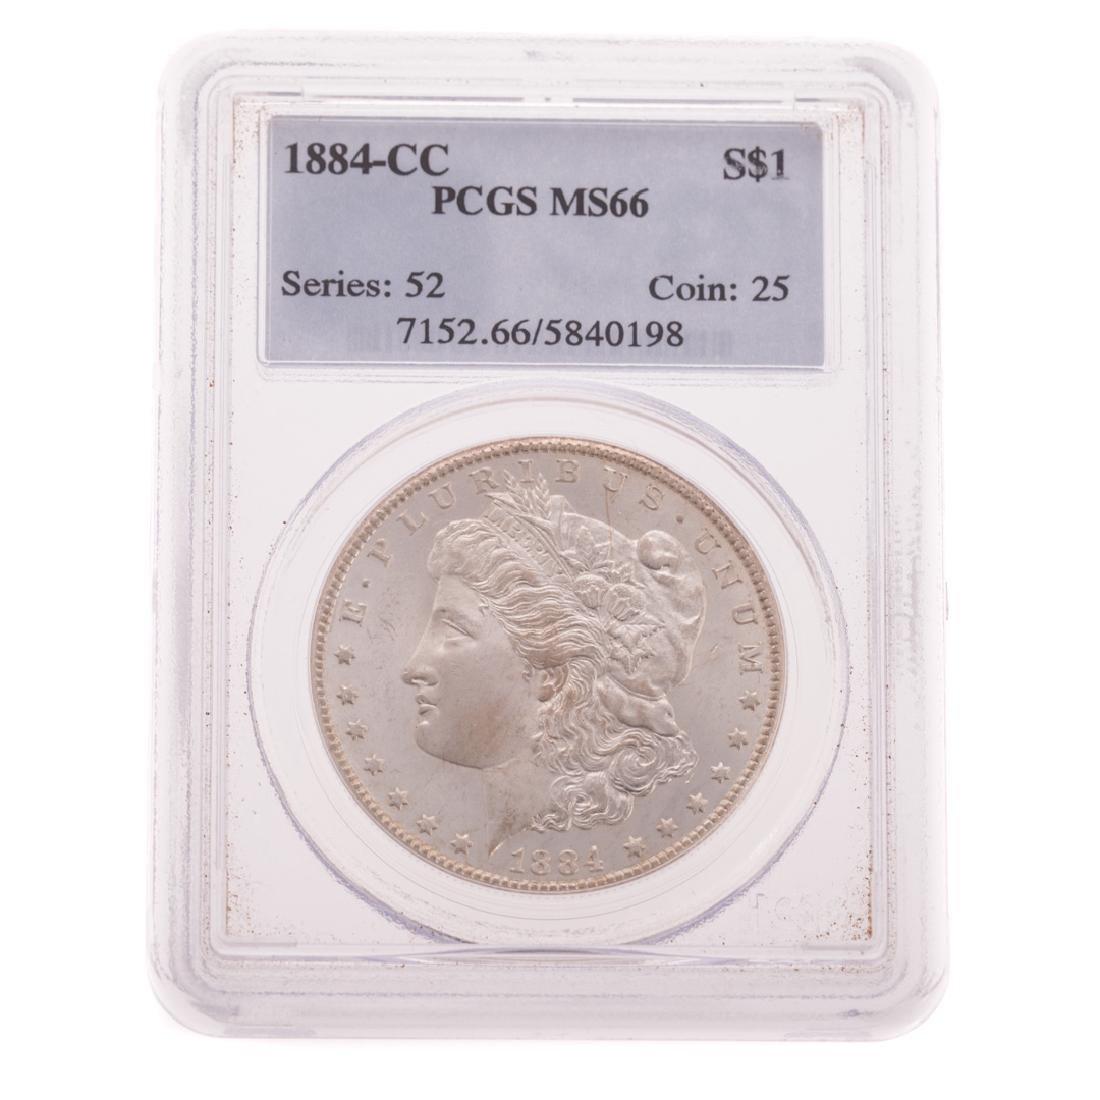 [US] 1884-CC PCGS MS66 Morgan Dollar